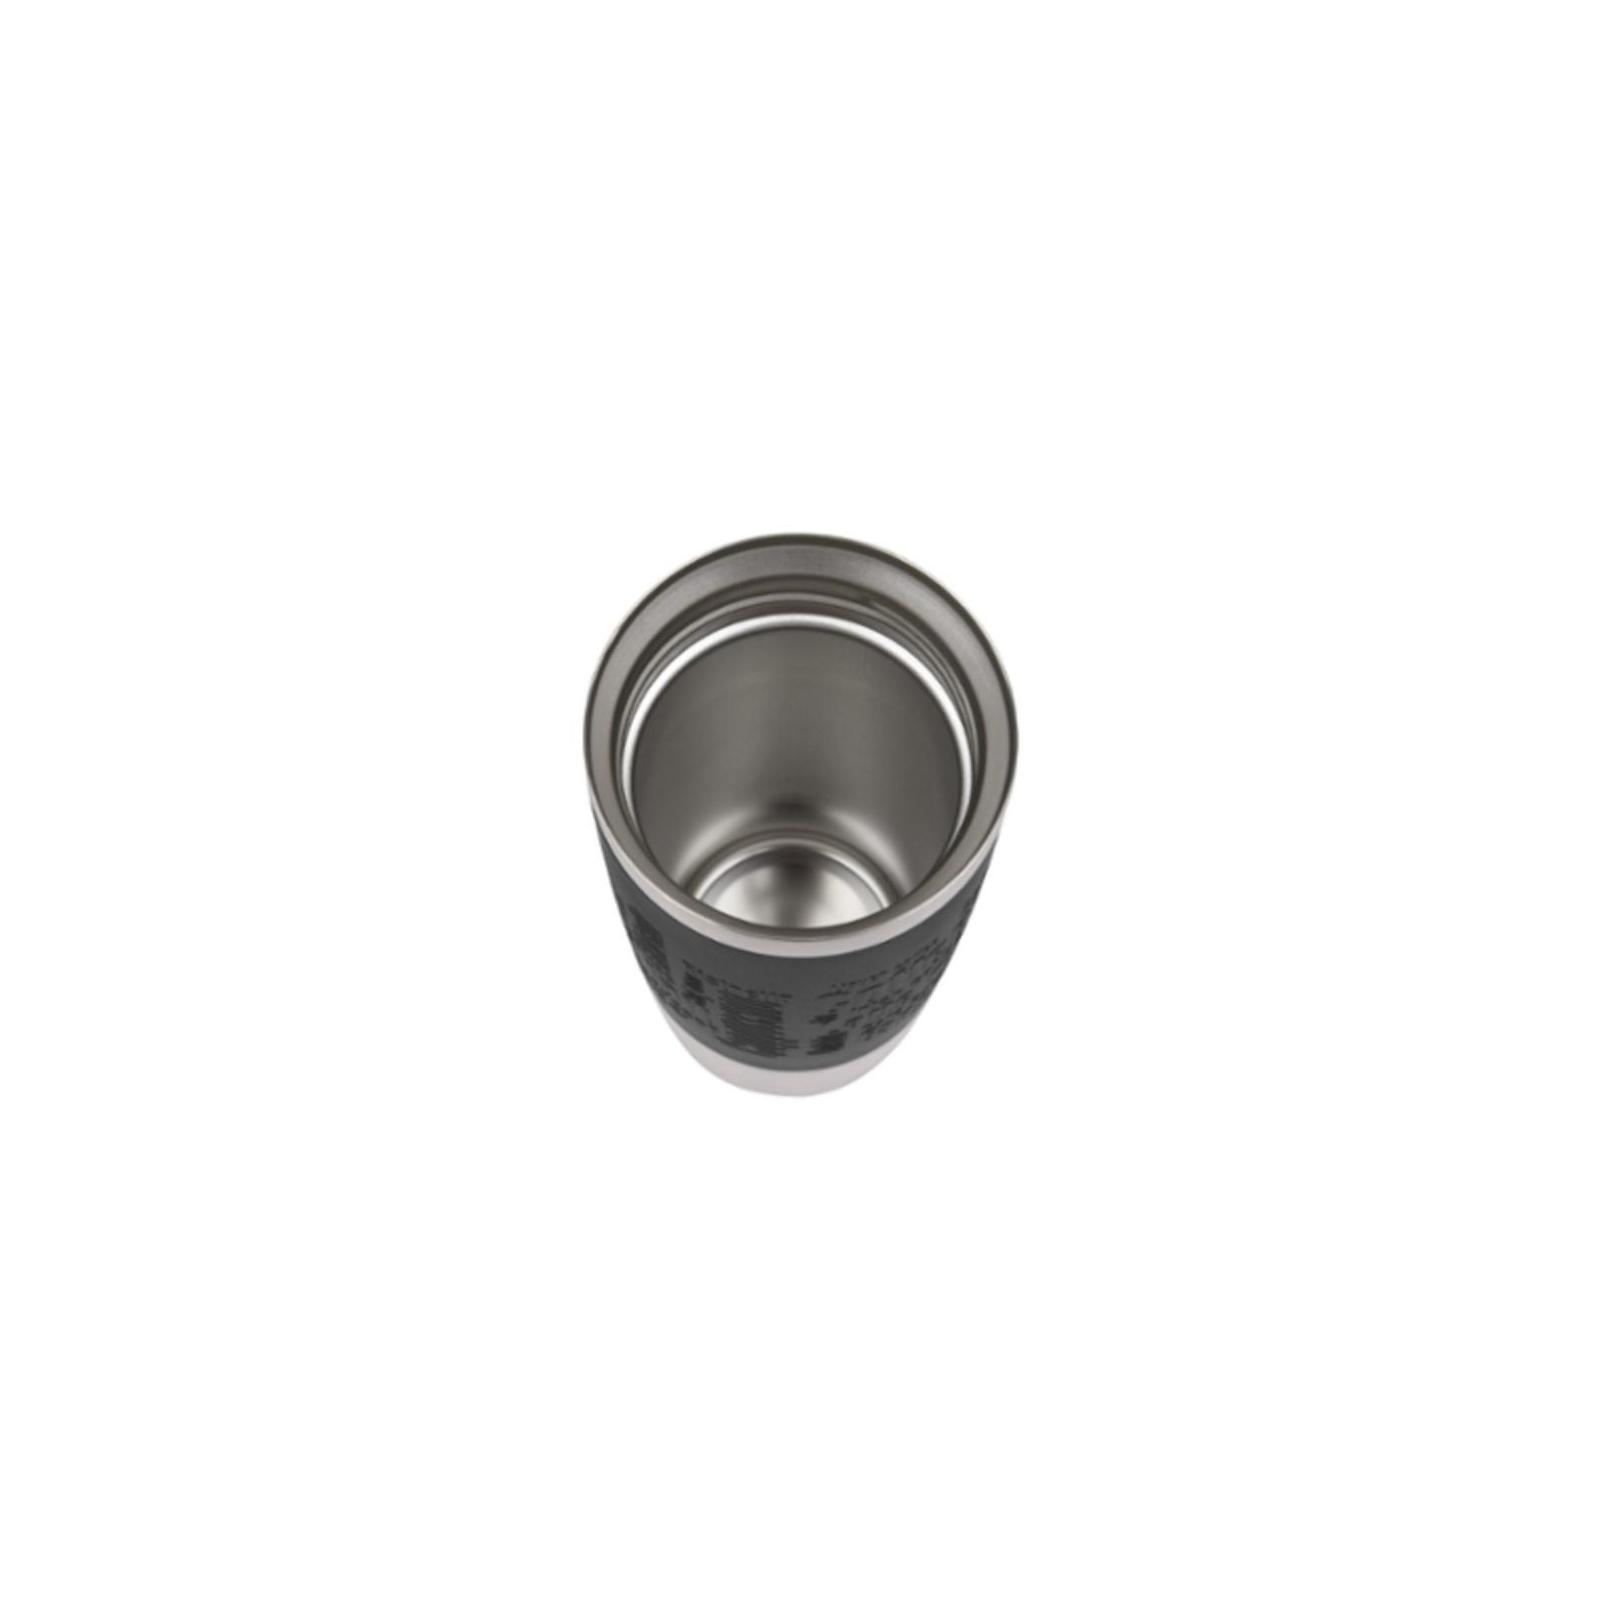 Термокружка Tefal TRAVEL MUG 0.36L raspb/silver (K3087114) изображение 5